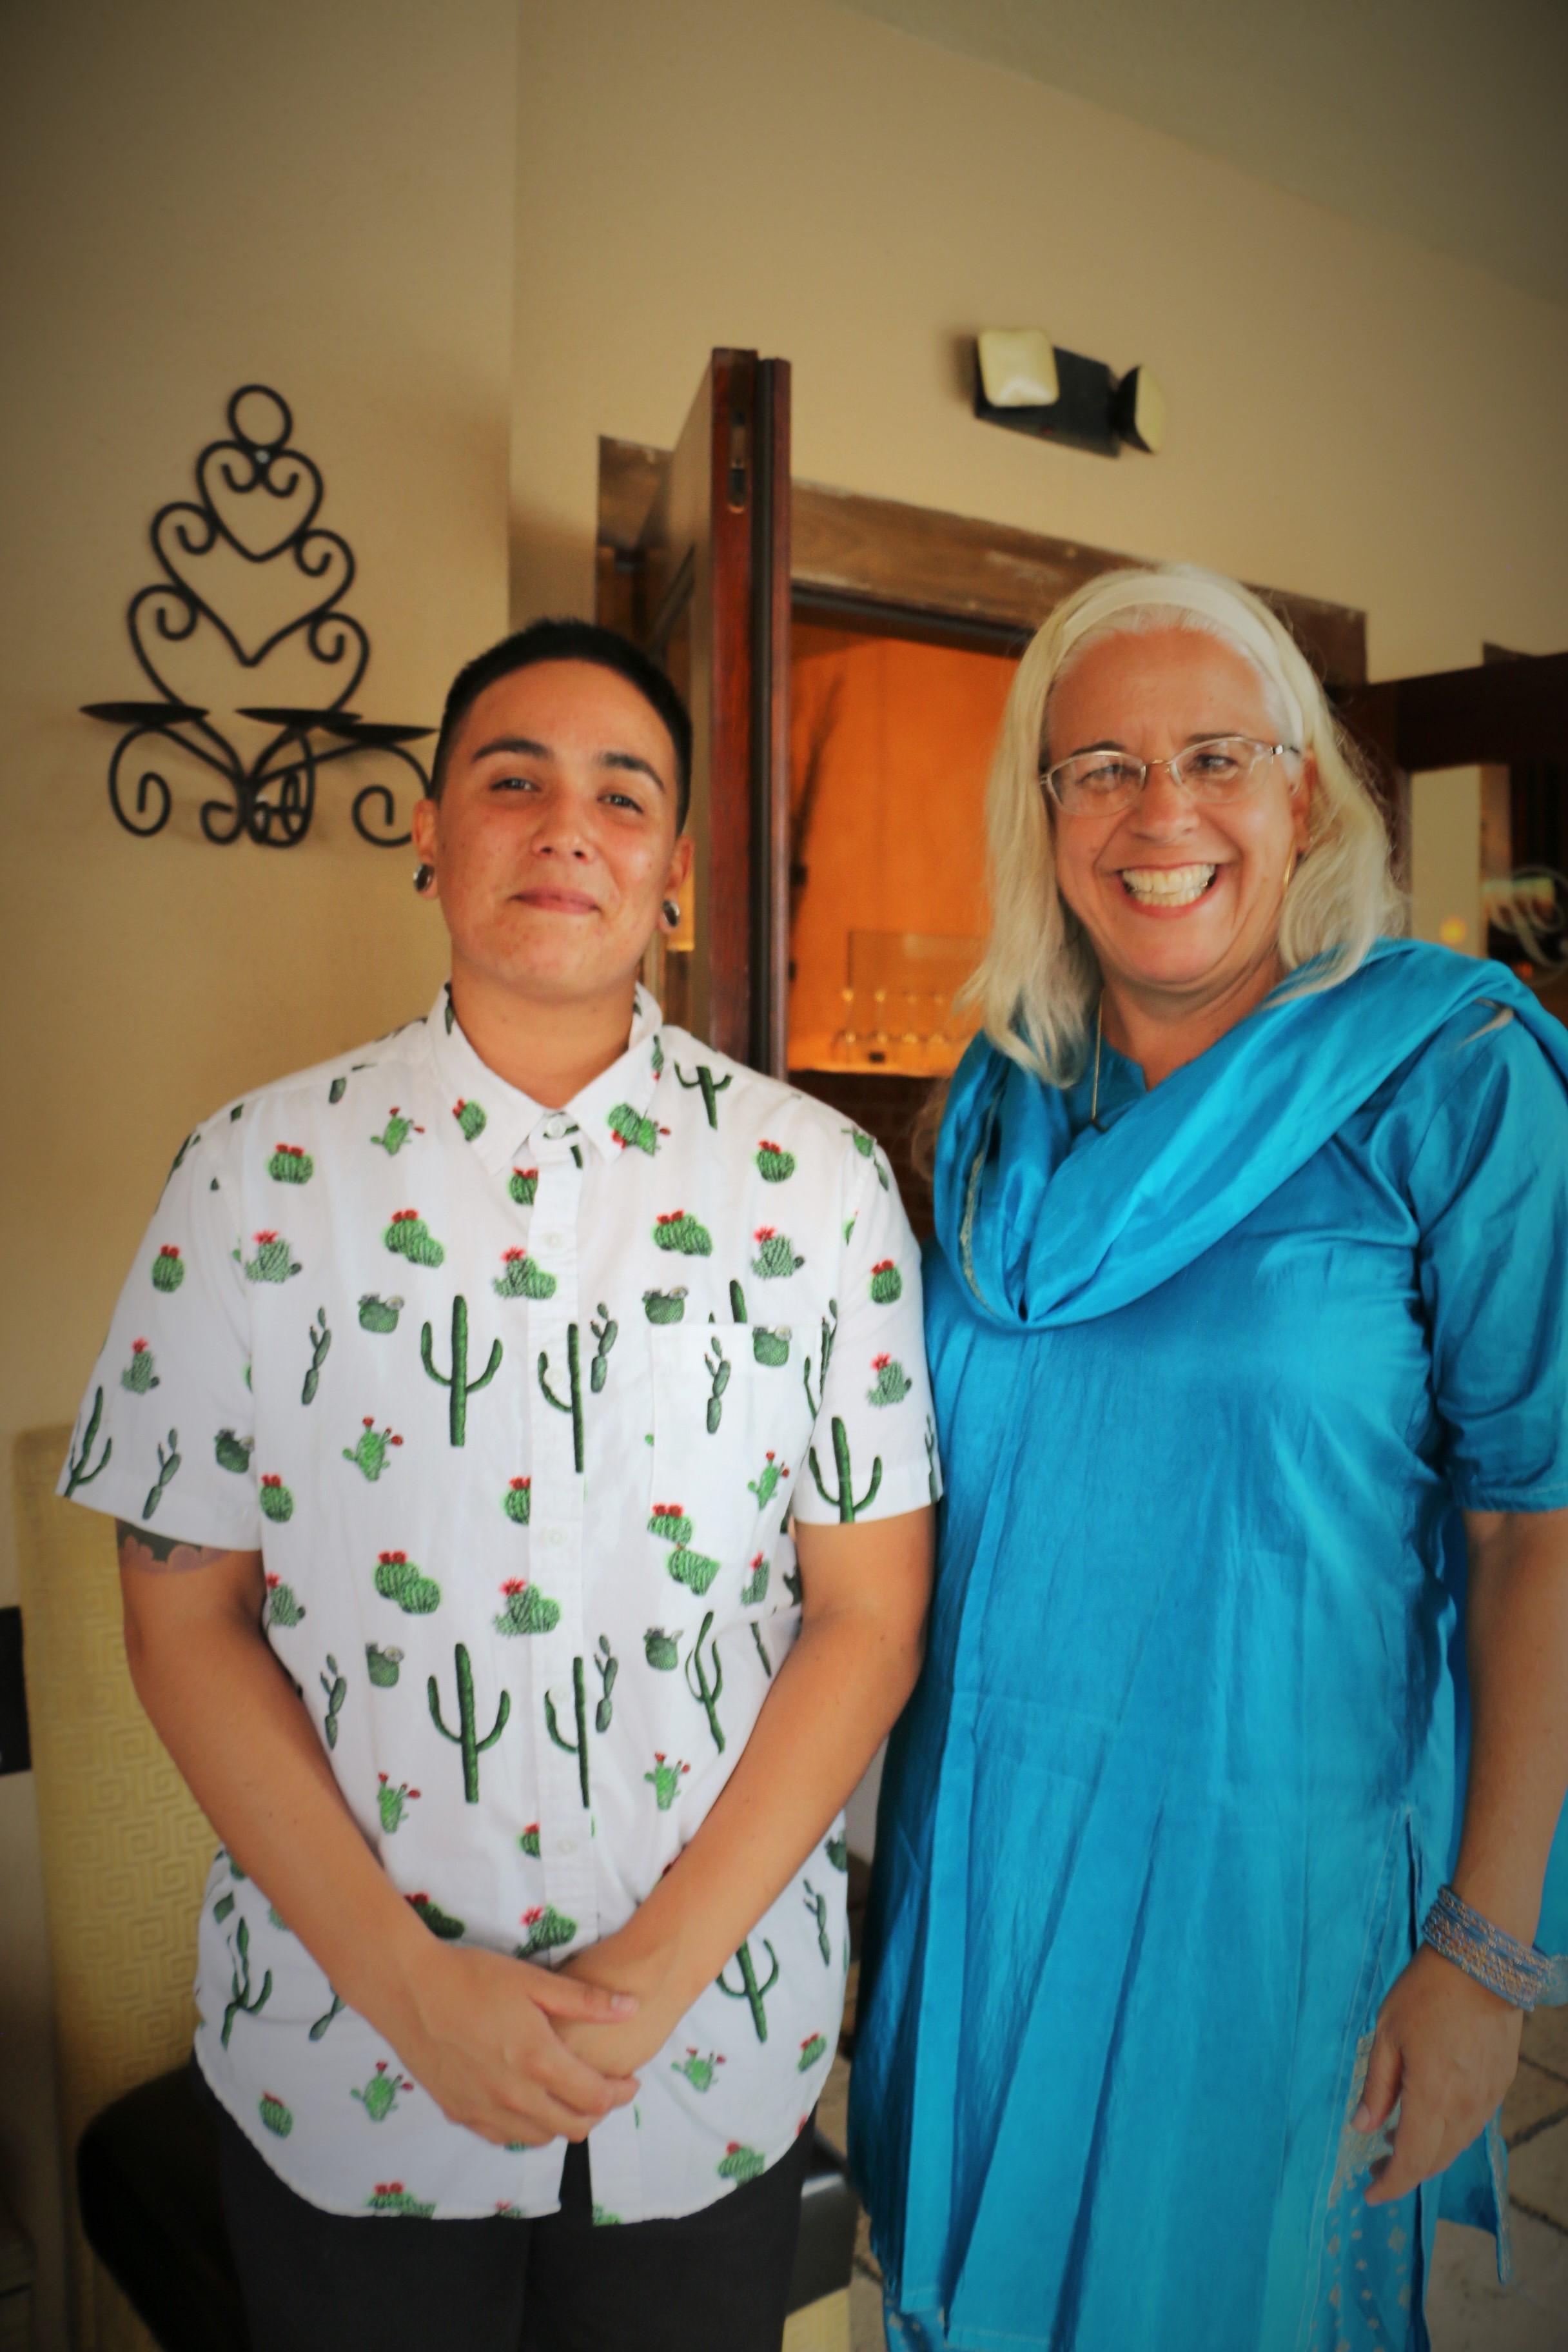 Tiana Vargas-Student and Dr. Doreen Mattingly Co-Chair, SDSU Women's Studies